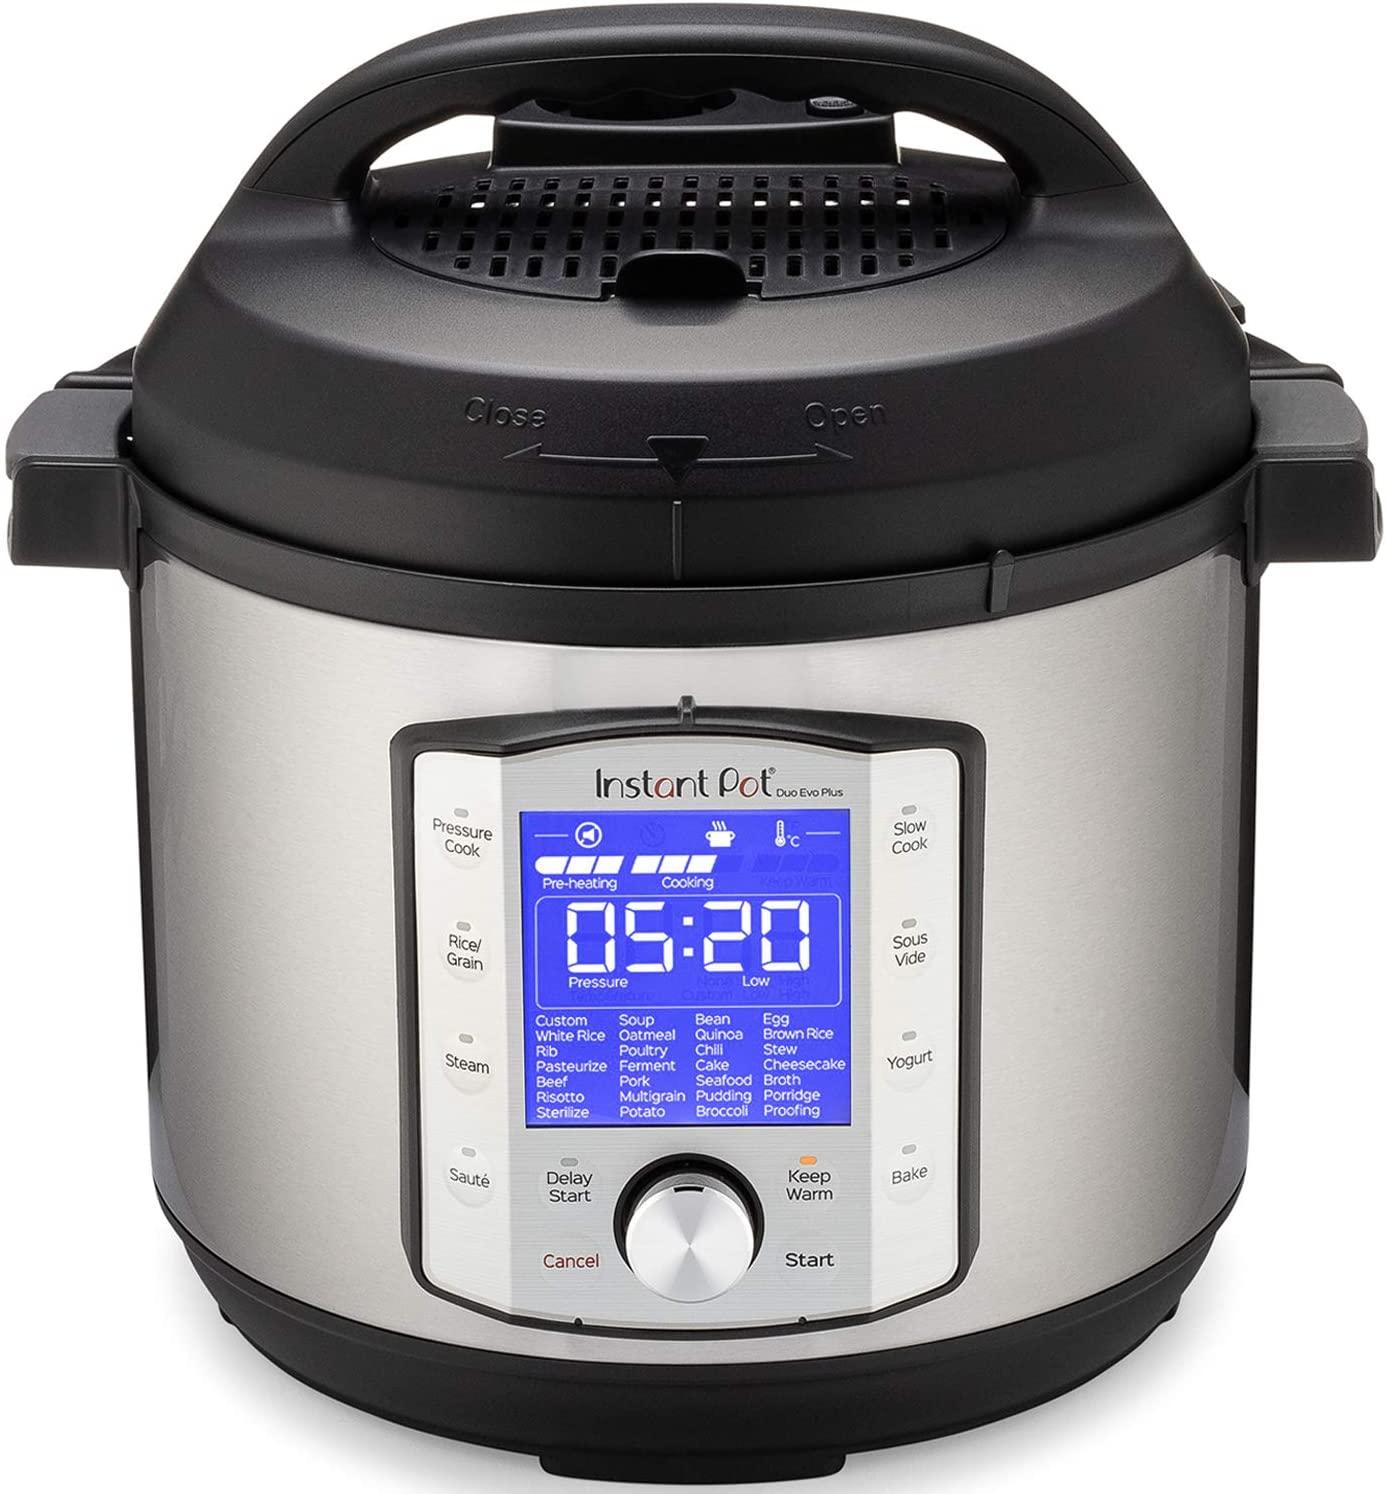 Instant Pot Duo Evo Plus Pressure Cooker 9 in 1, 6 Qt